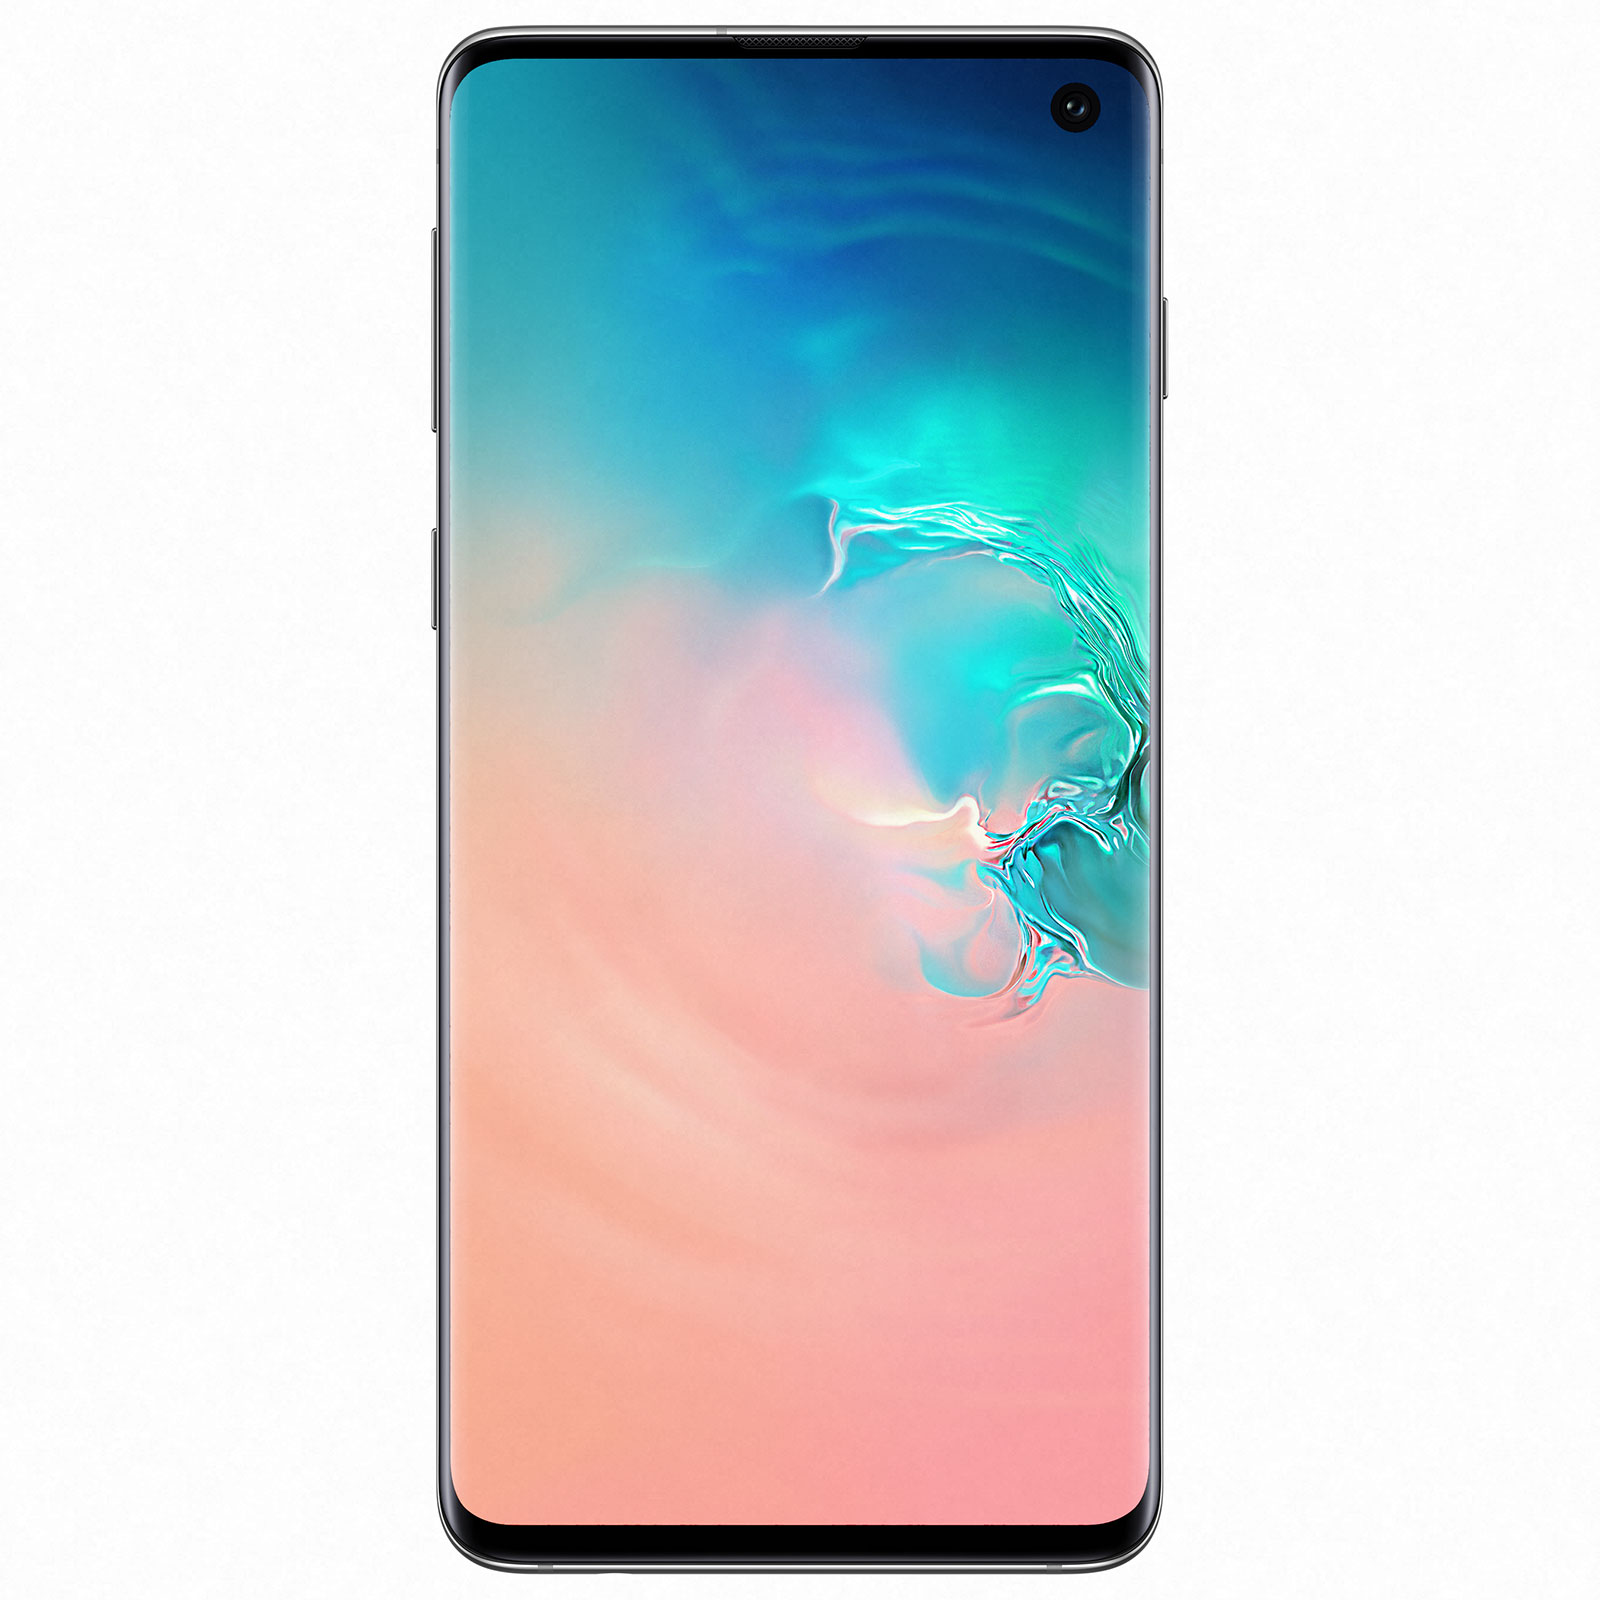 "Mobile & smartphone Samsung Galaxy S10 SM-G973F Blanc Prisme (8 Go / 128 Go) Smartphone 4G-LTE Advanced Dual SIM IP68 - Exynos 9820 8-Core 2.8 GHz - RAM 8 Go - Ecran tactile Super AMOLED 6.1"" 1440 x 3040 - 128 Go - NFC/Bluetooth 5.0 - 3400 mAh - Android 9.0"